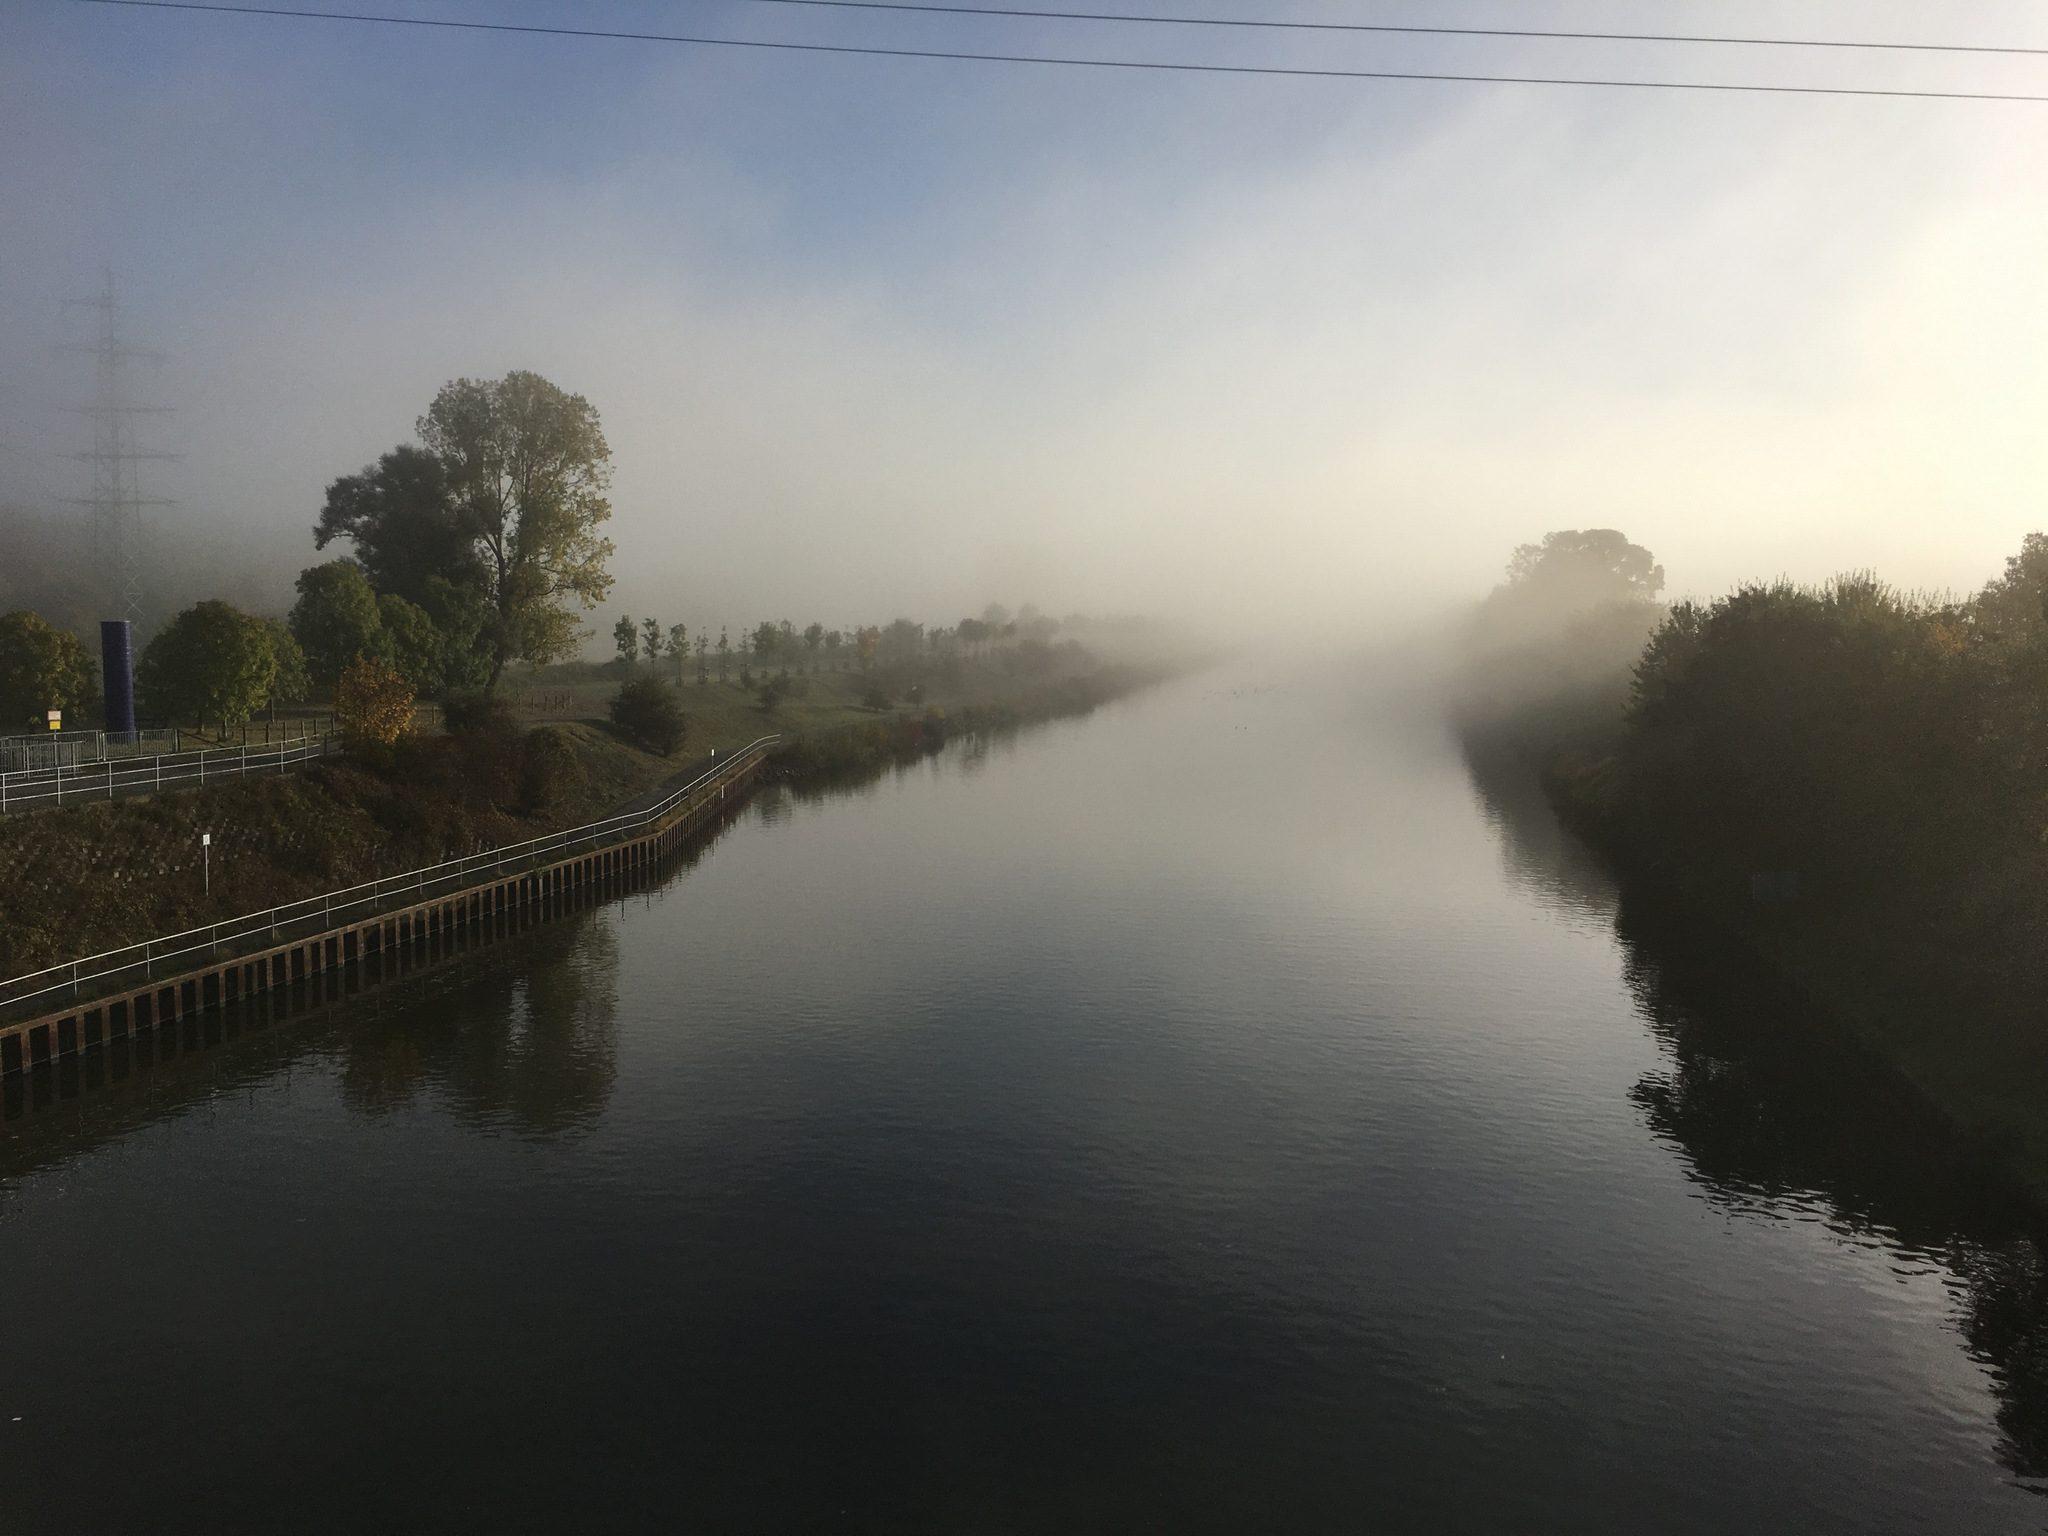 Rhein-Herne-Kanal vs. Nebel.